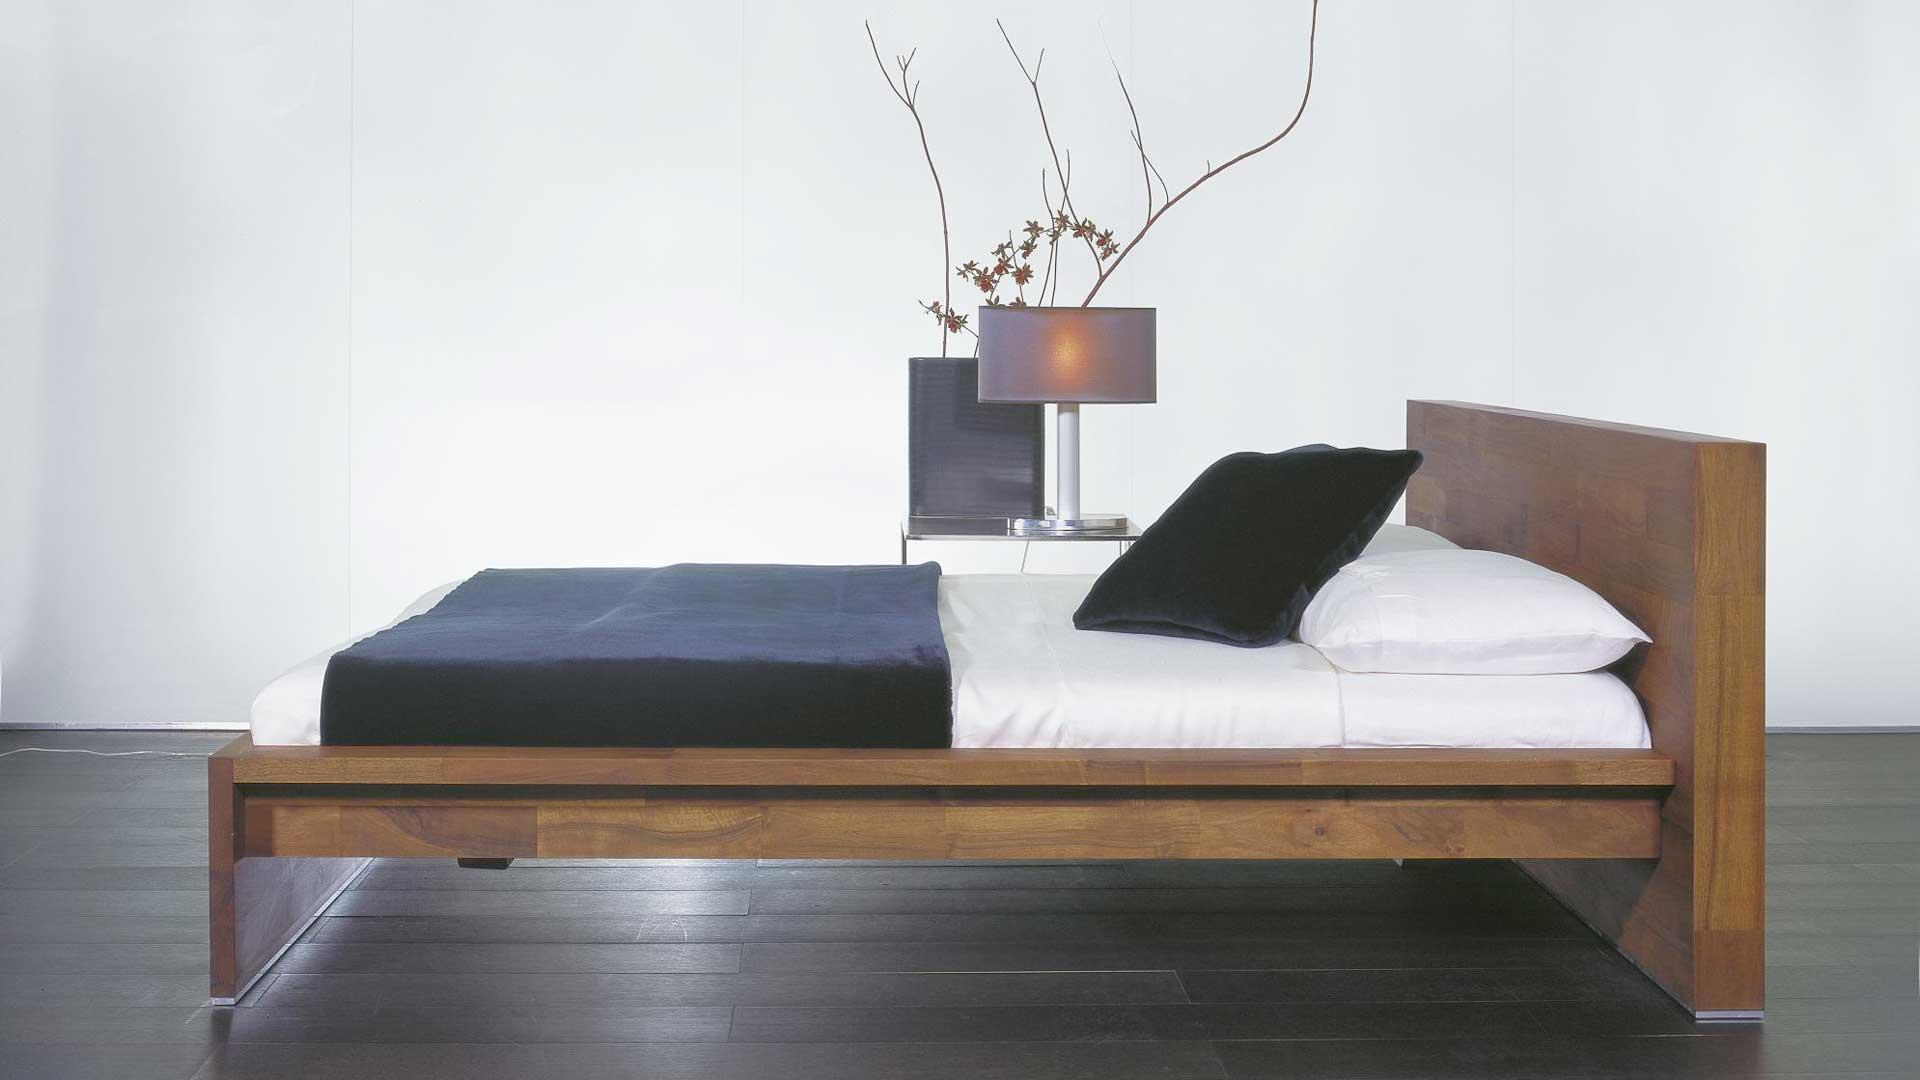 betten hoenscheidt holzbetten luna2 betten h nscheidt. Black Bedroom Furniture Sets. Home Design Ideas